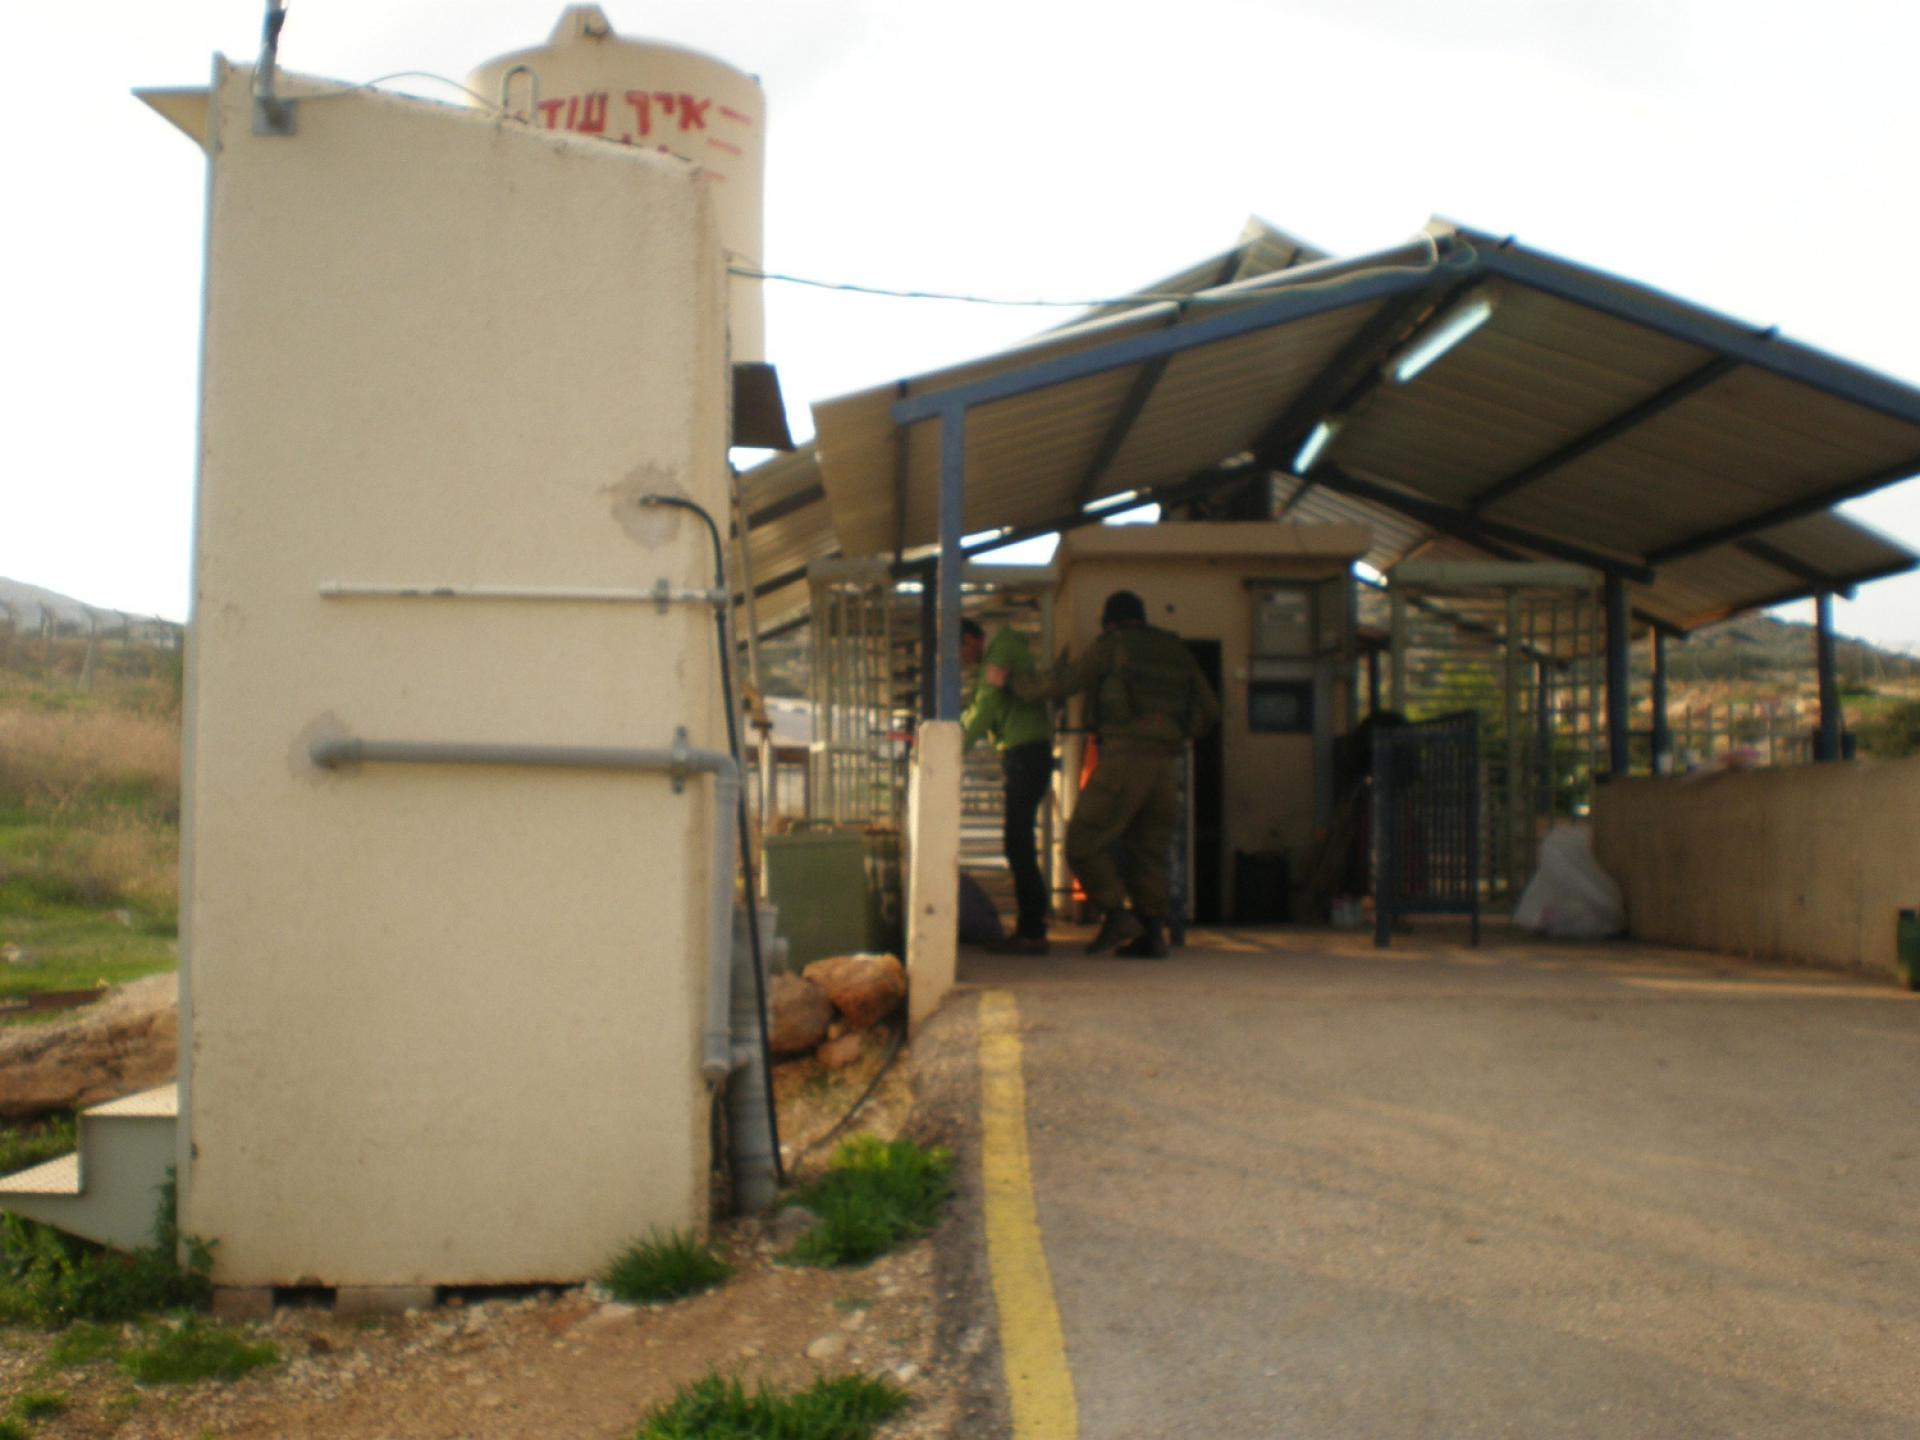 Tayasir checkpoint 09.02.11